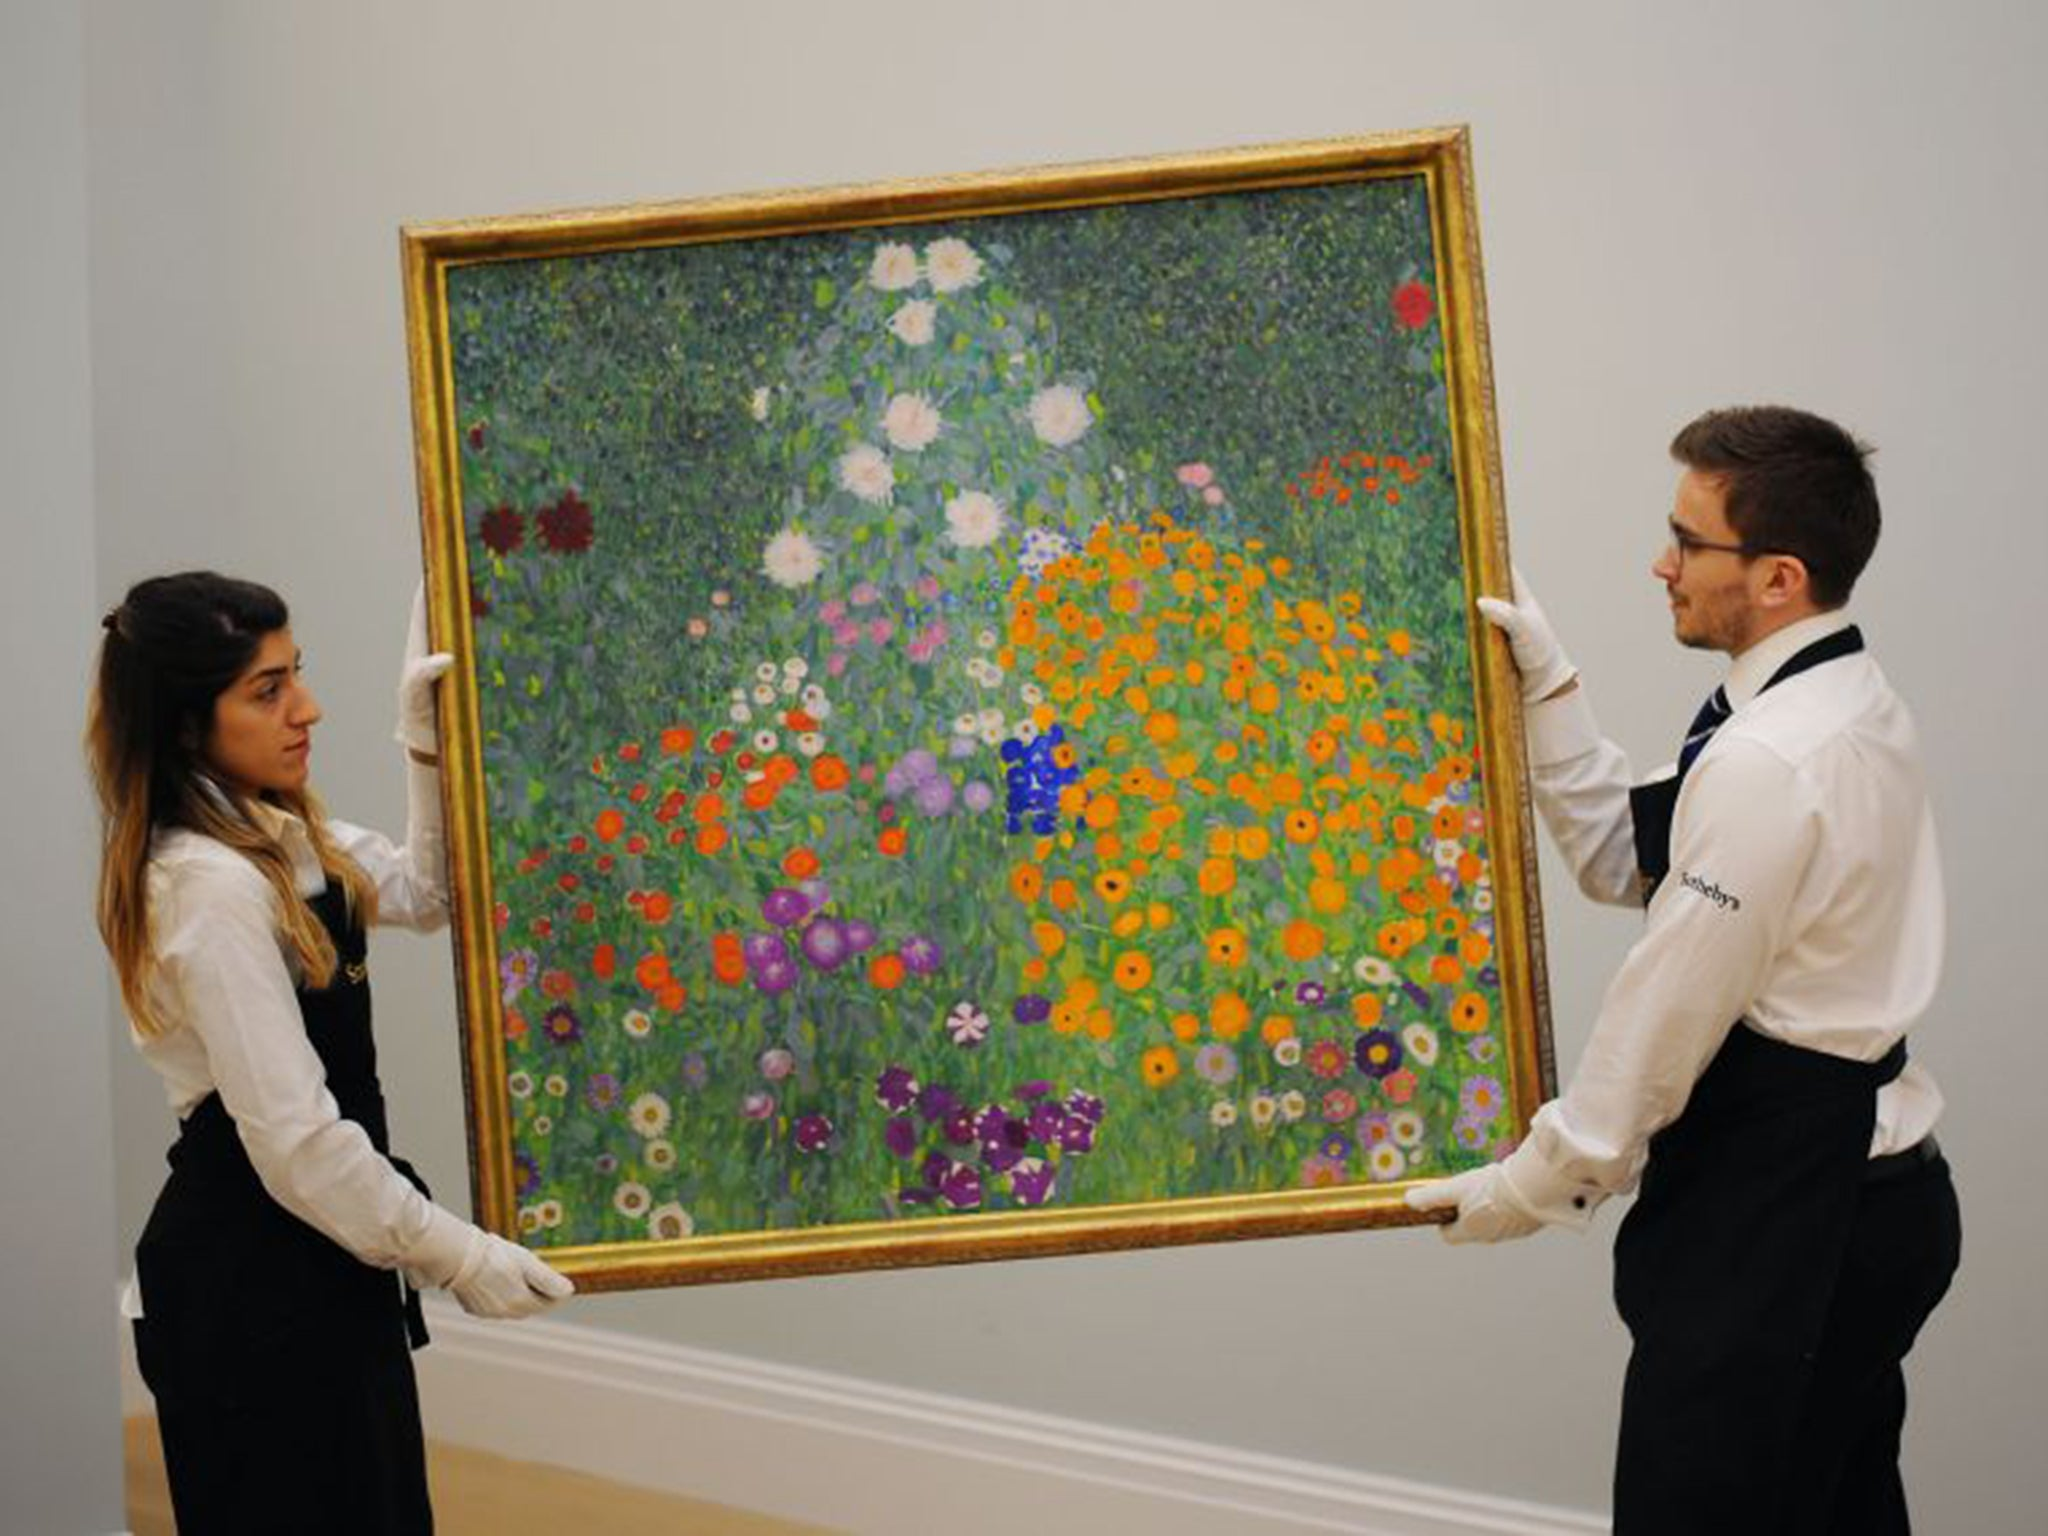 Gustav Klimt painting sells for £48m at Sotheby's underscoring resilience of high-end fine art market